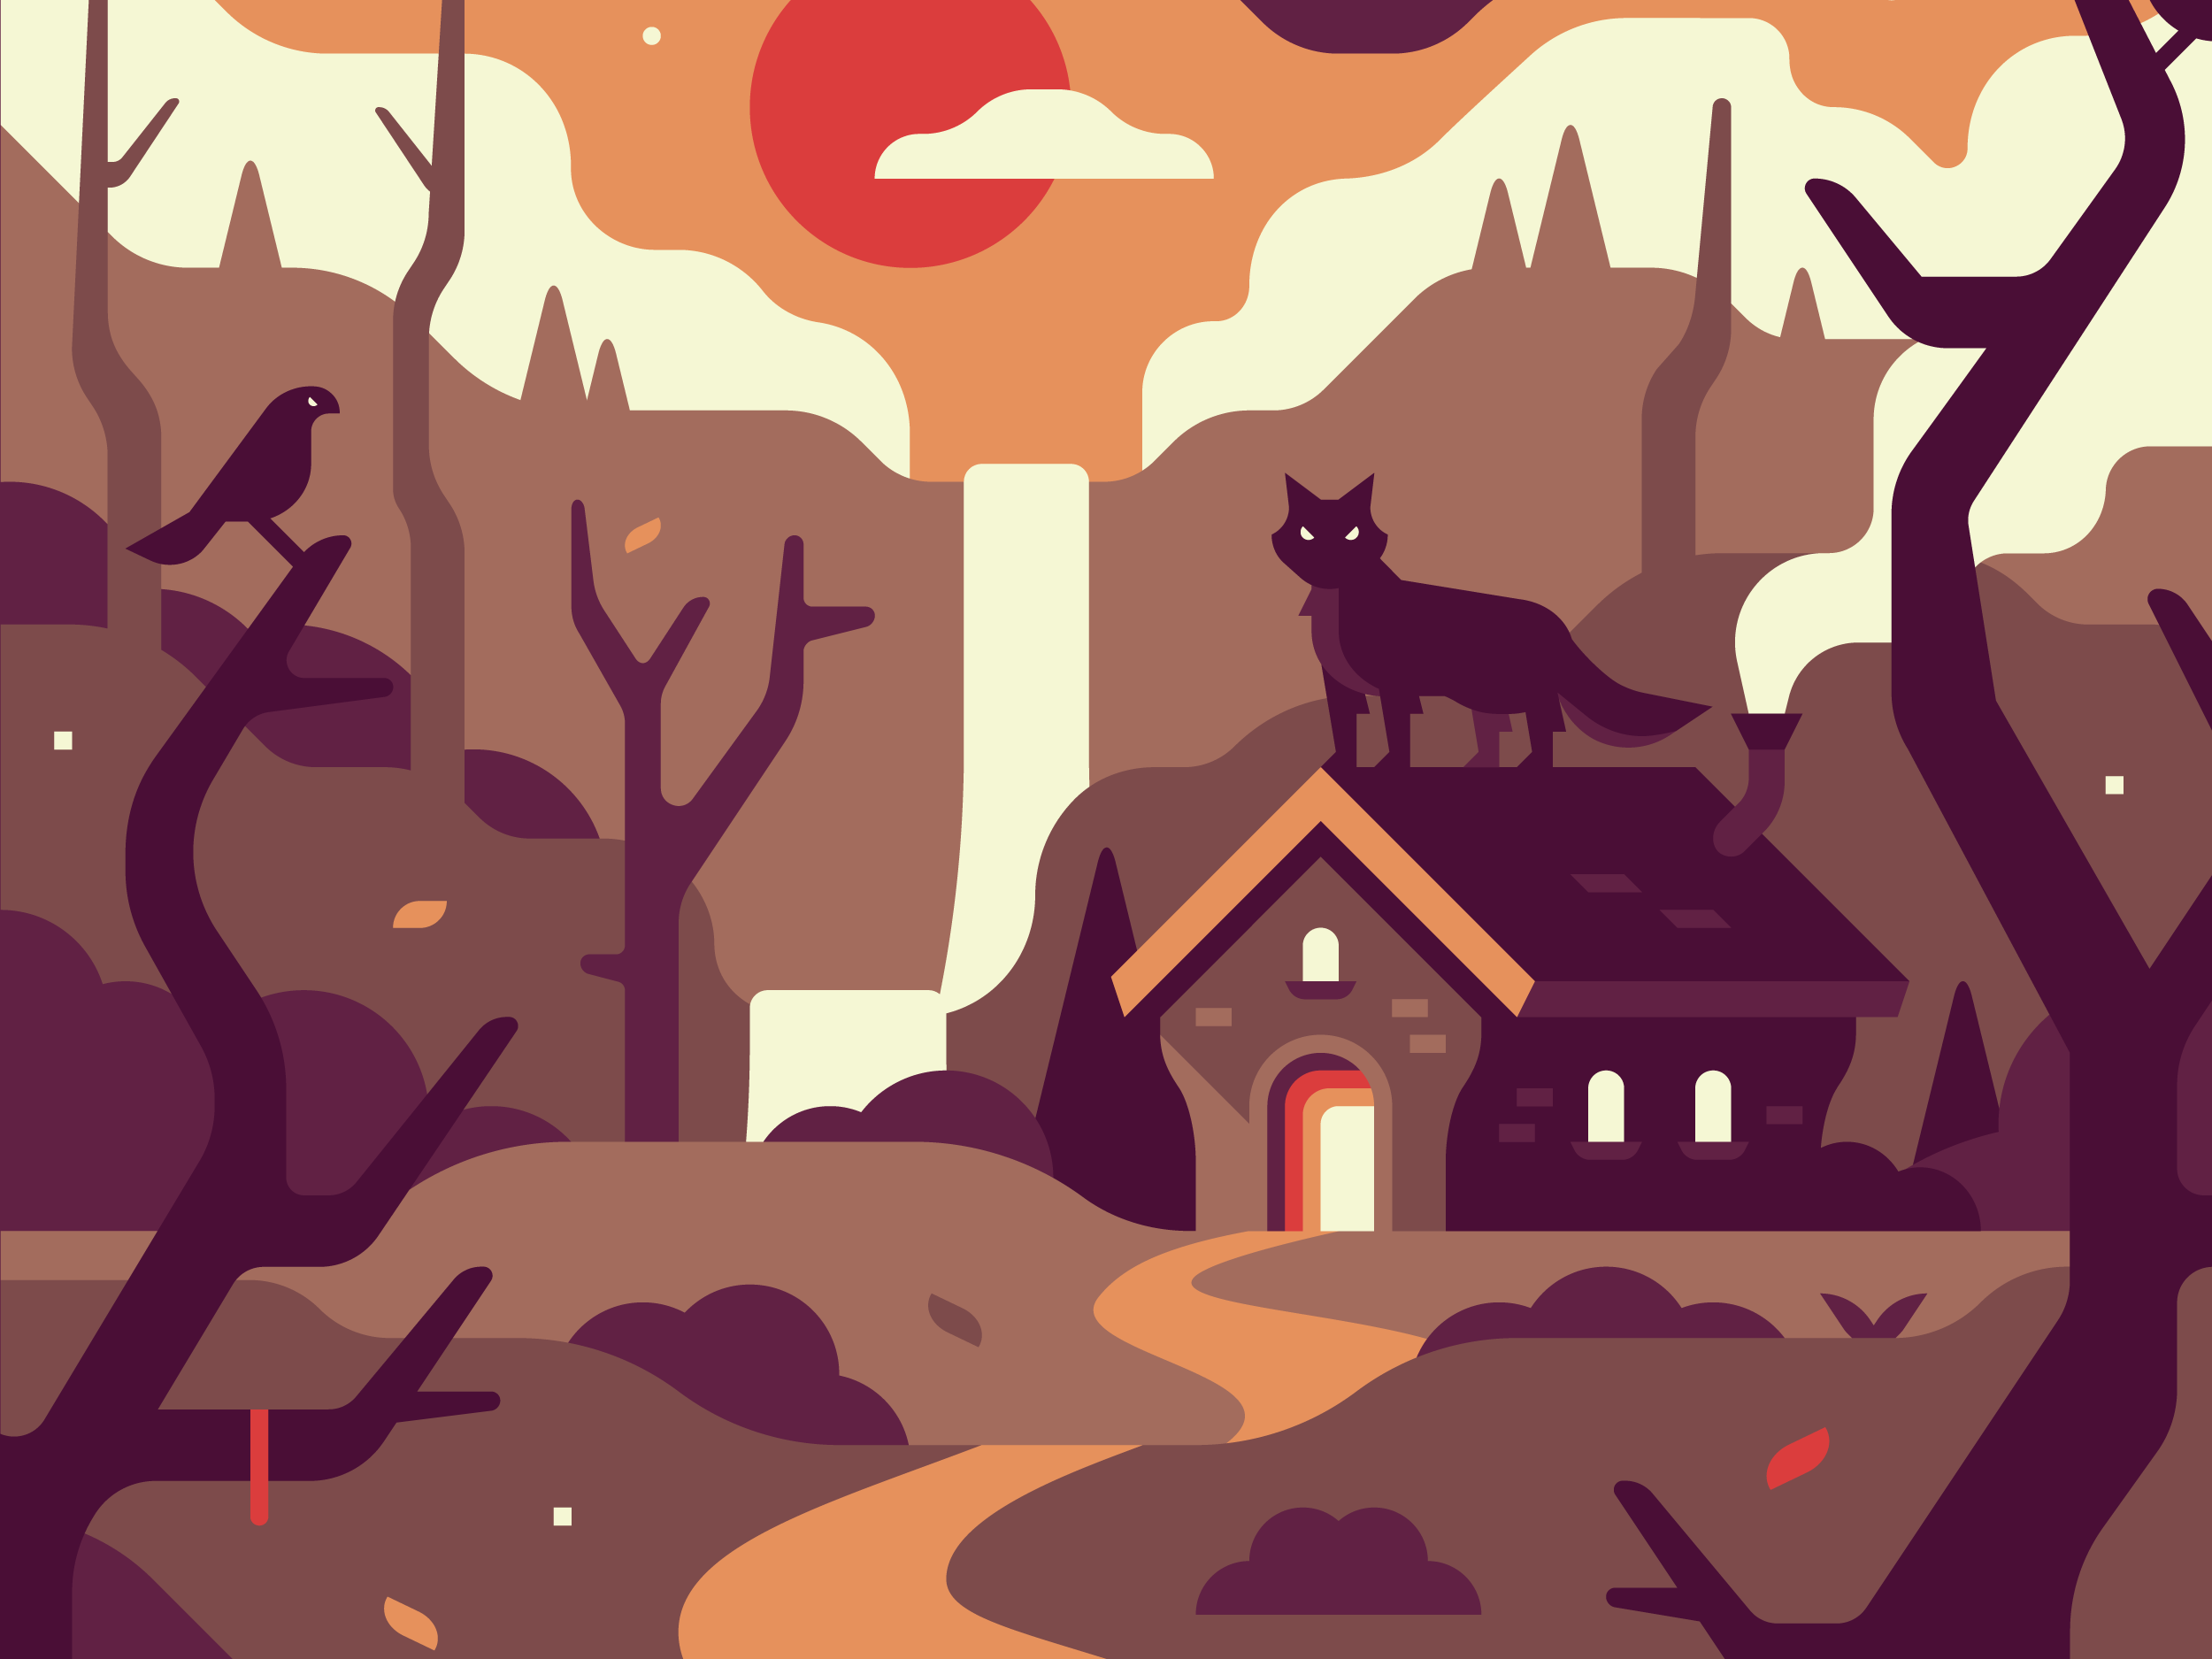 Fandom Dark Fairy Tales by Alex Pasquarella, Canopy